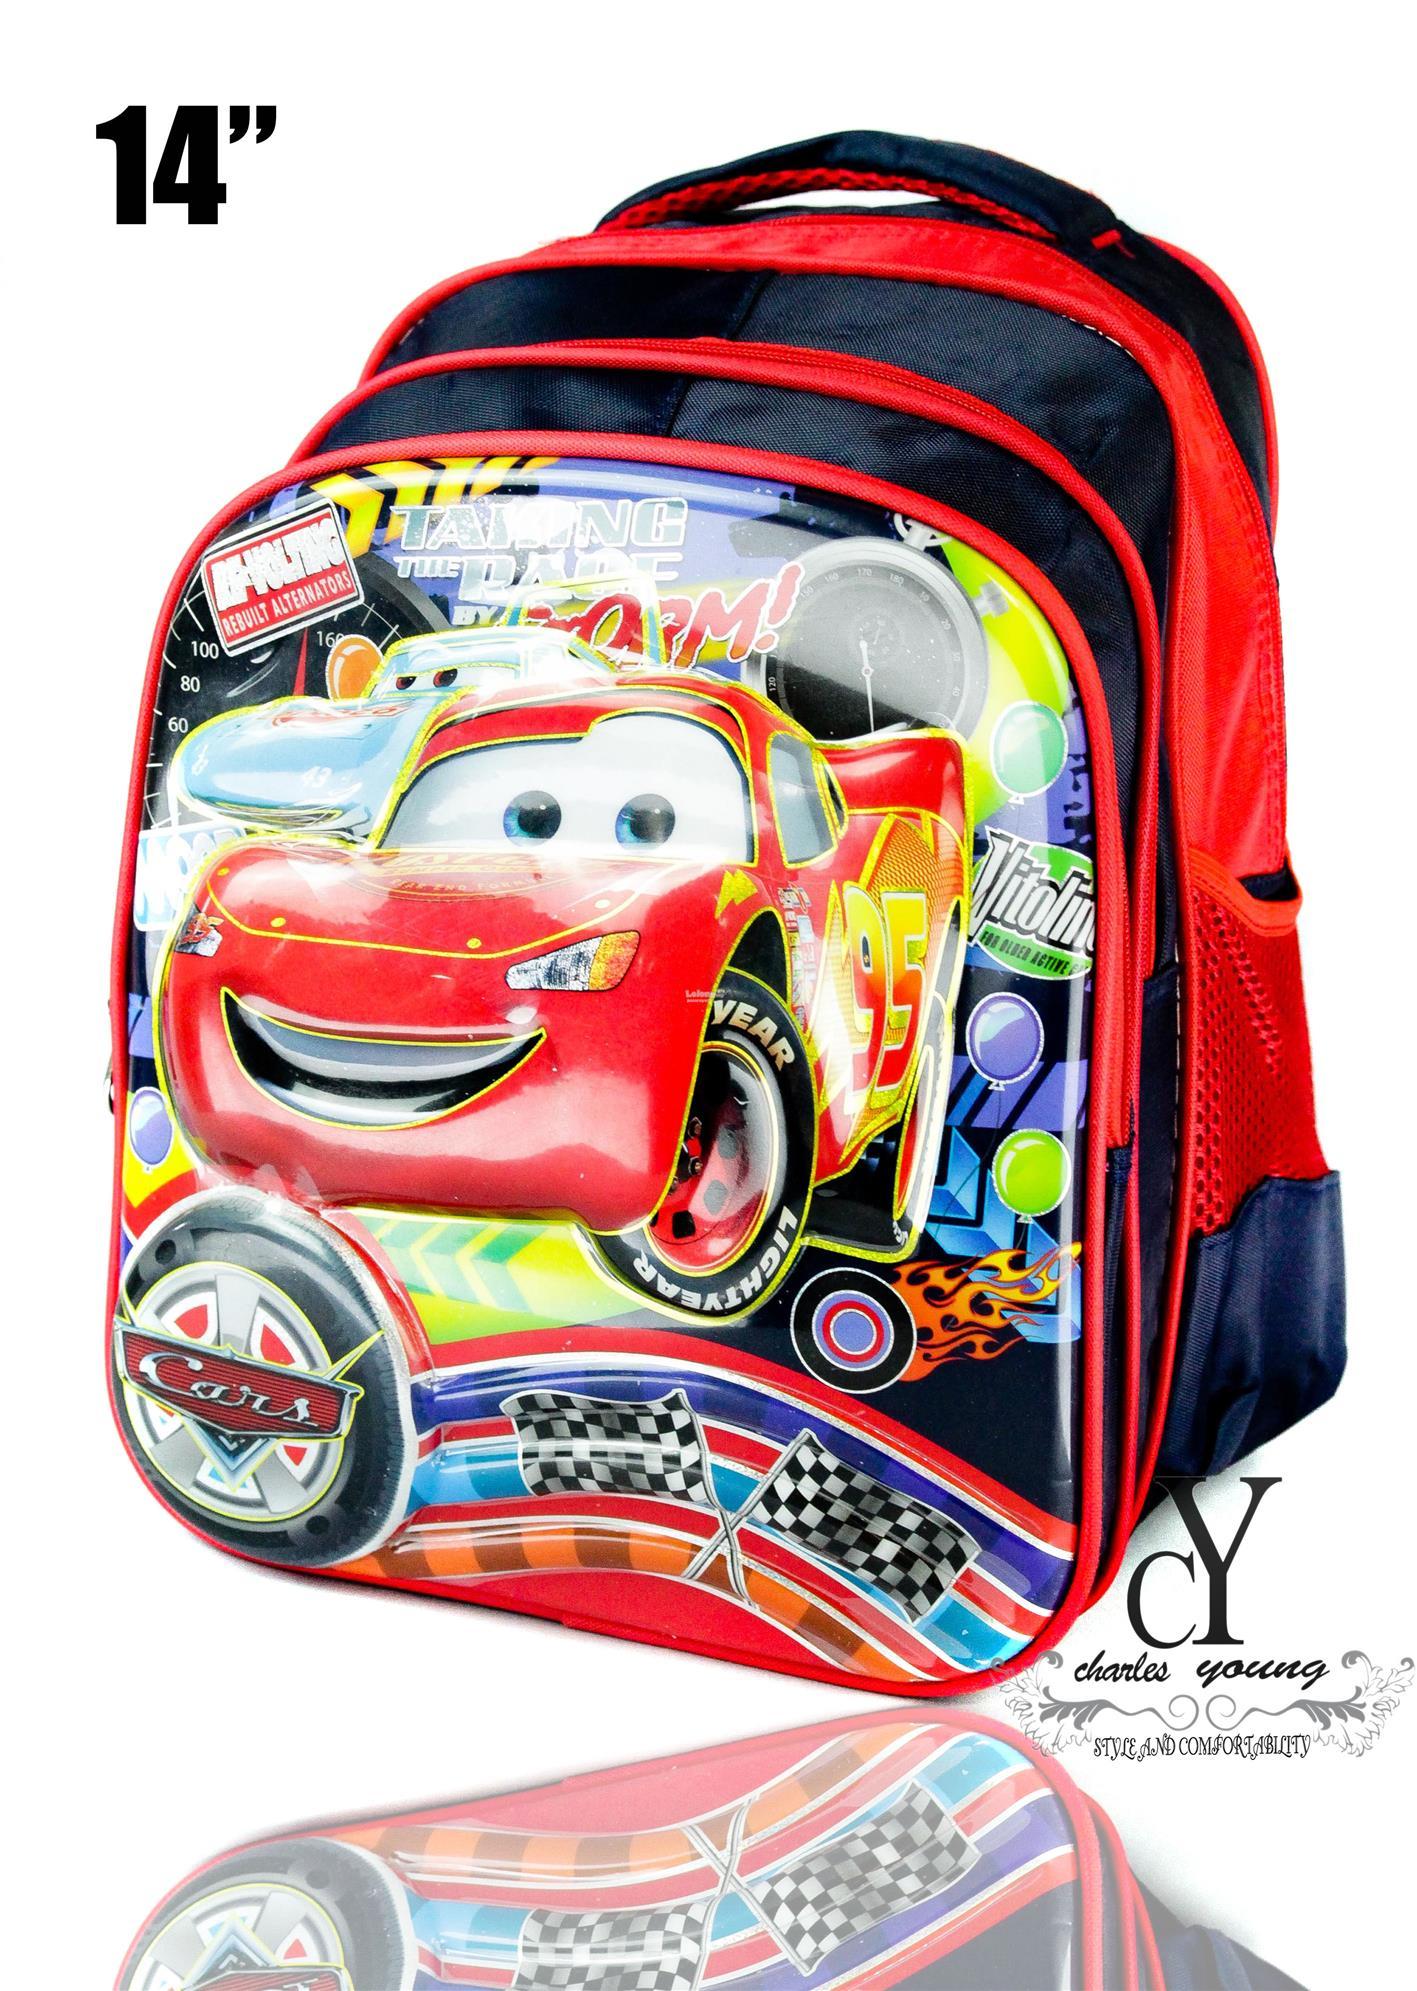 Uncategorized Disney Cars Pictures To Print schoolbagsekolah3dprintdisney end 11292018 915 pm schoolbagsekolah3dprintdisneycarscar